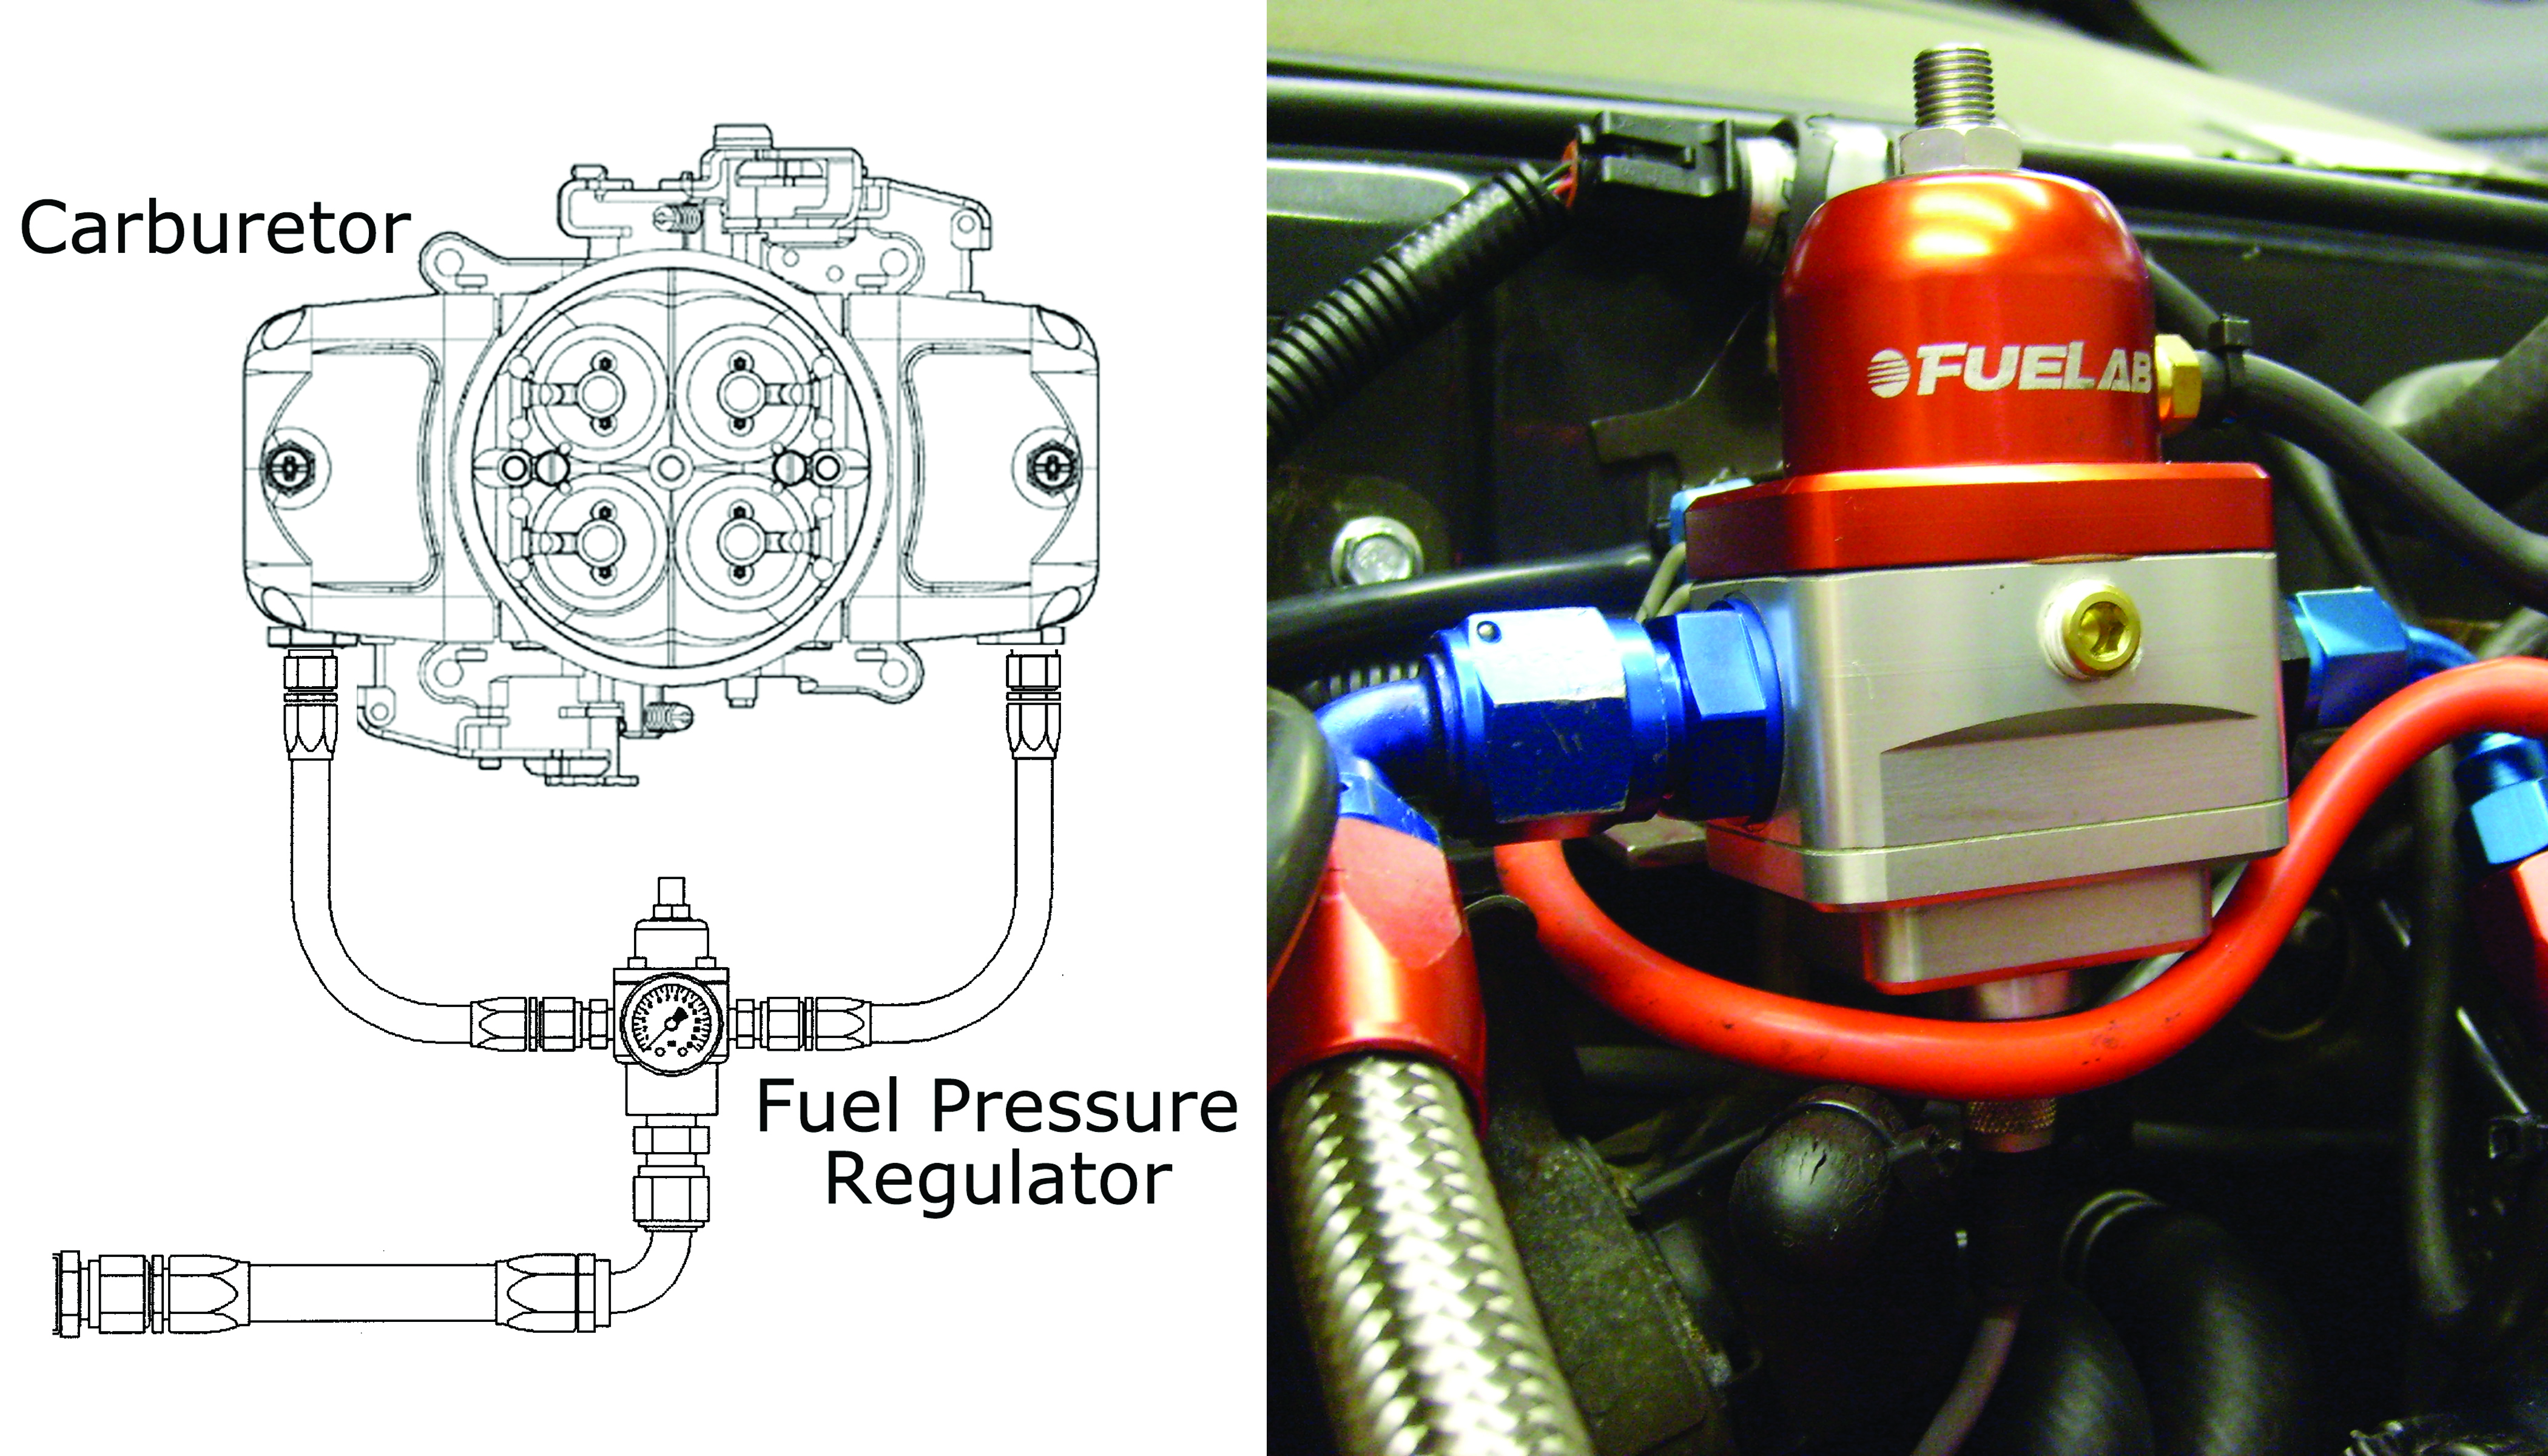 05-FuelPressureReg